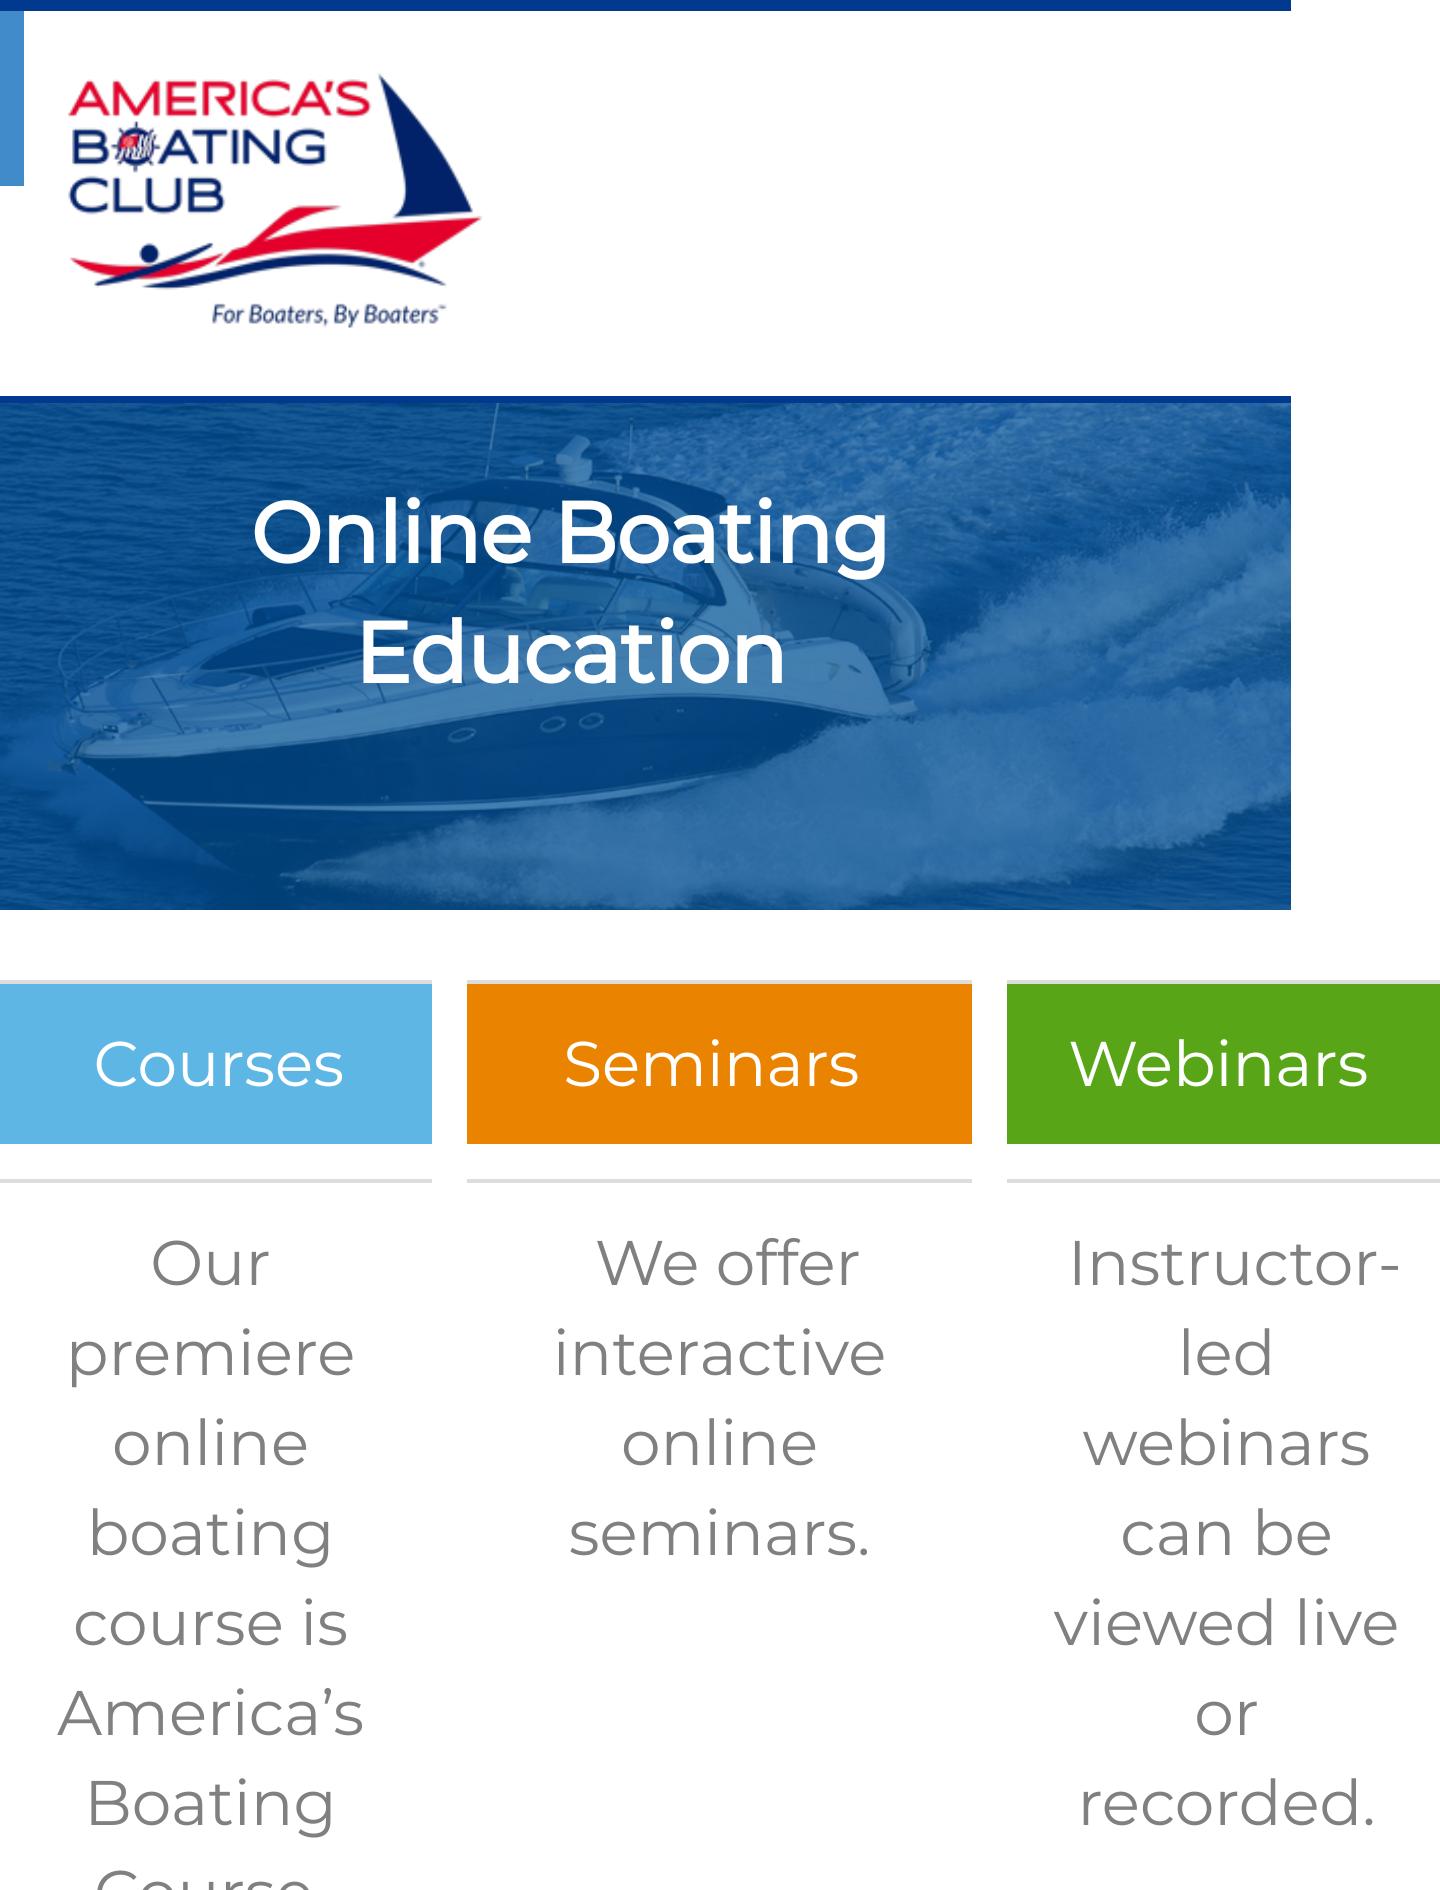 americasboatingclubnationalonlineeducation.png